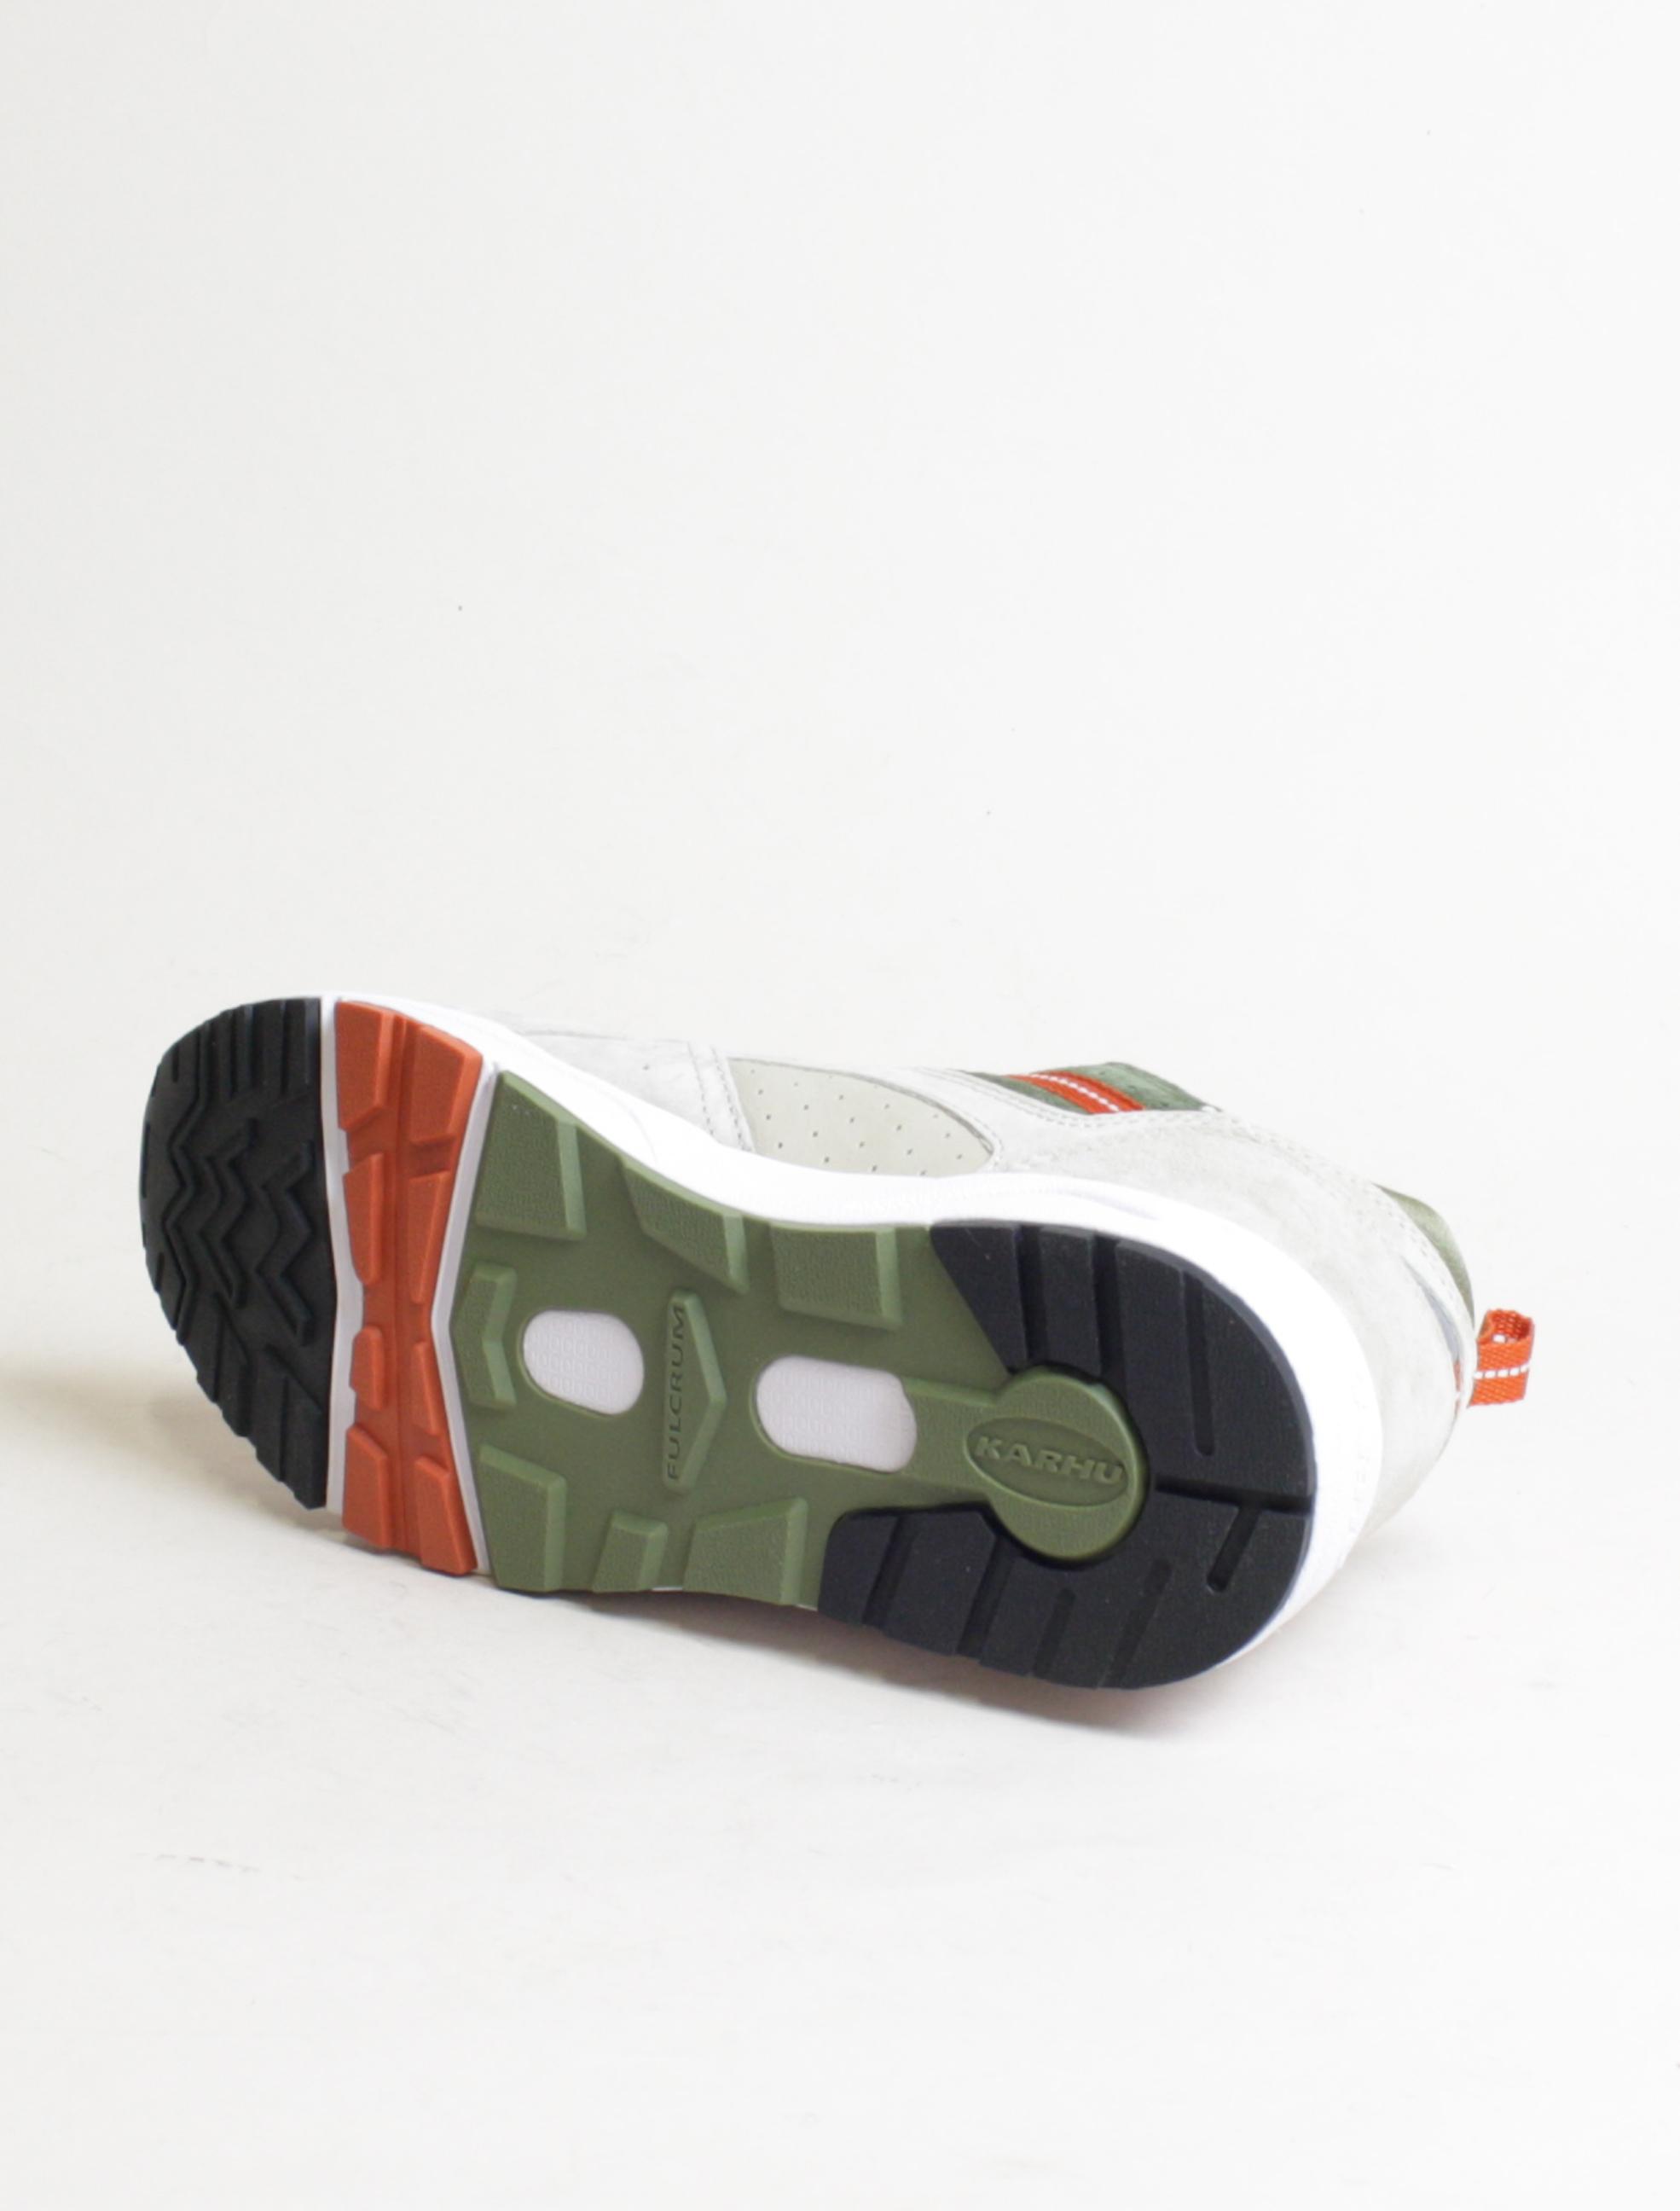 Karhu Fusion 2.0 Peyote Military Olive dettaglio suola